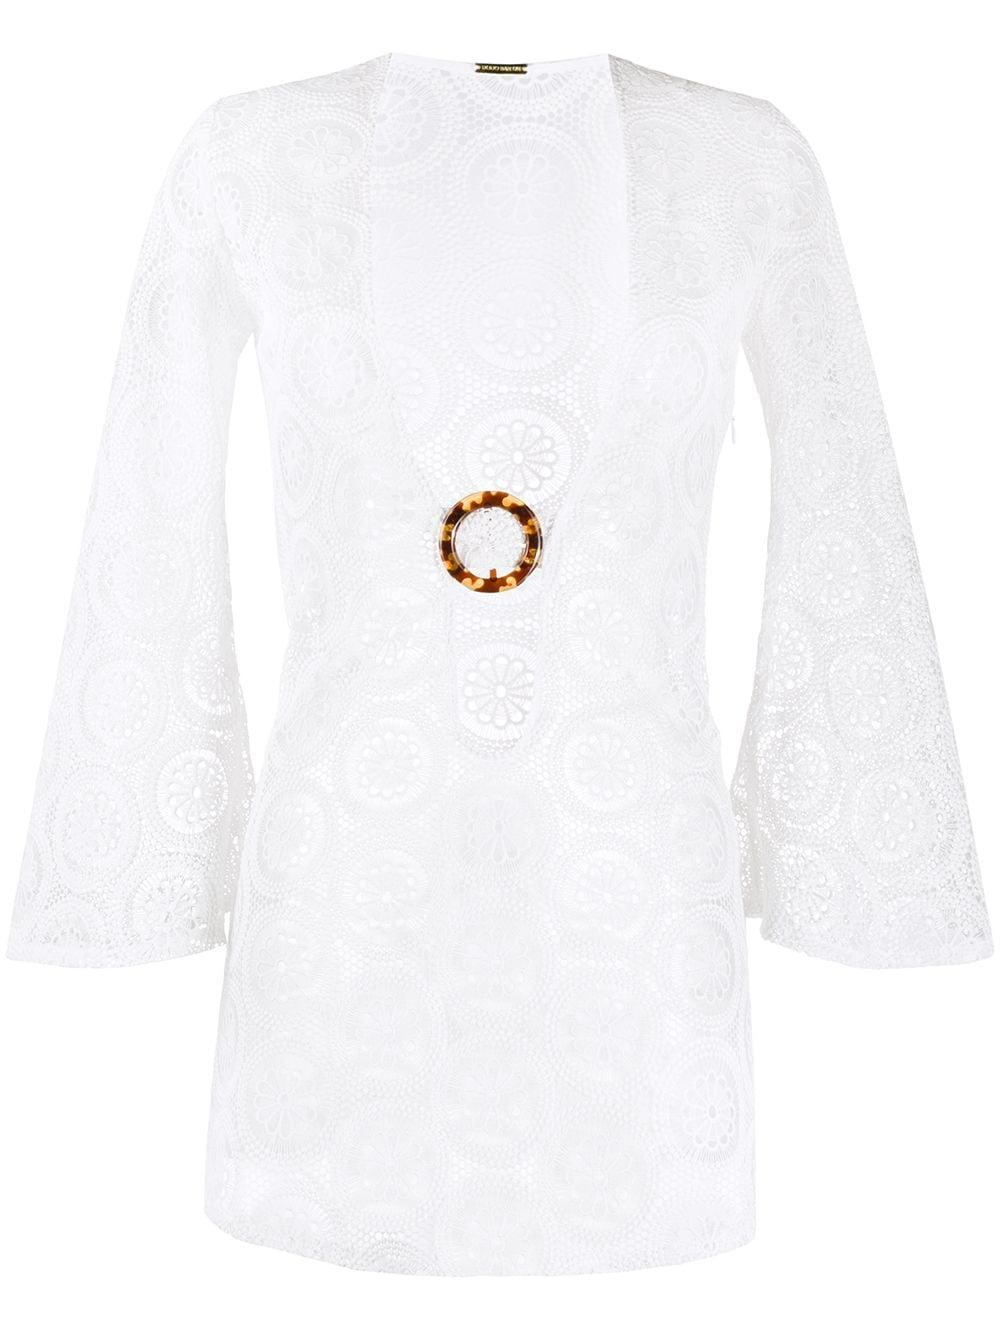 Jane Mini Crochet Dress